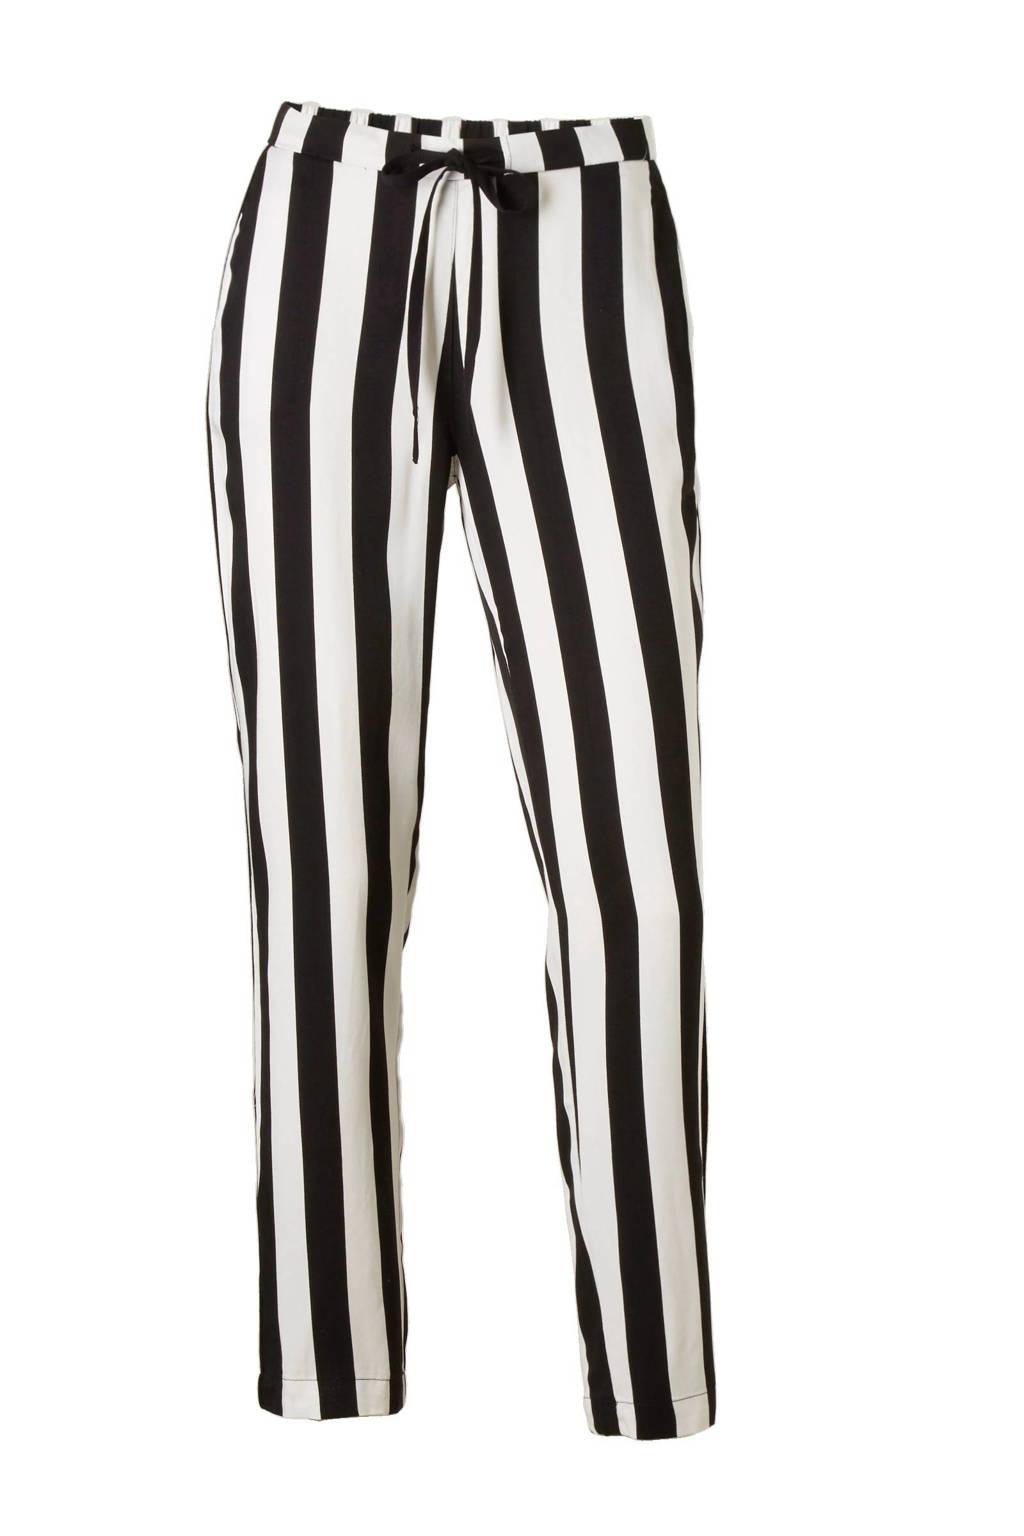 b7636546ed77d0 Mango gestreepte broek zwart - wit, Zwart/wit